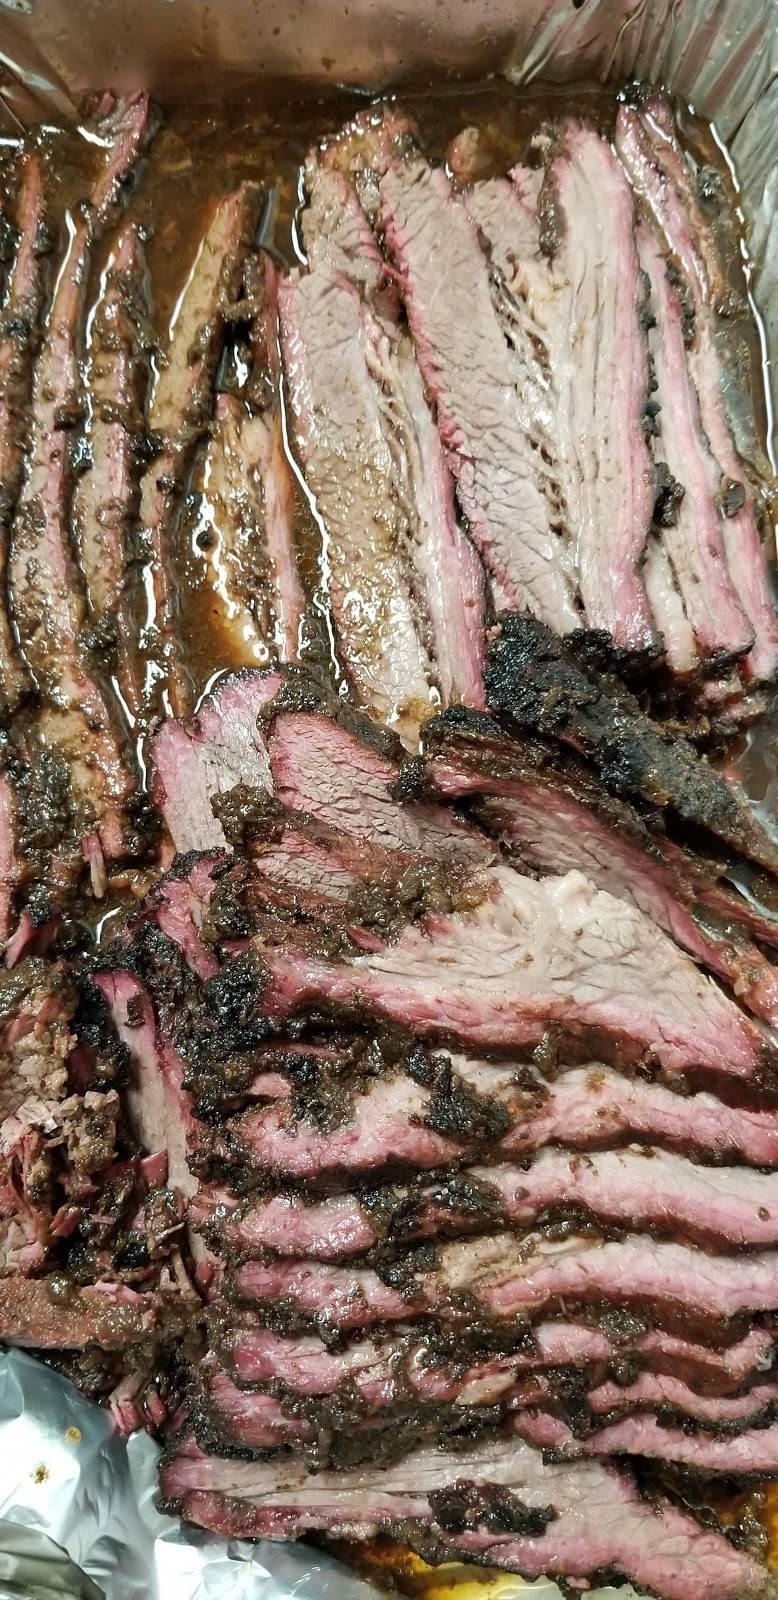 Hanks Smokin Hot BBQ & Catering Company | restaurant | 4865 US-209, Elizabethville, PA 17023, USA | 7173952291 OR +1 717-395-2291